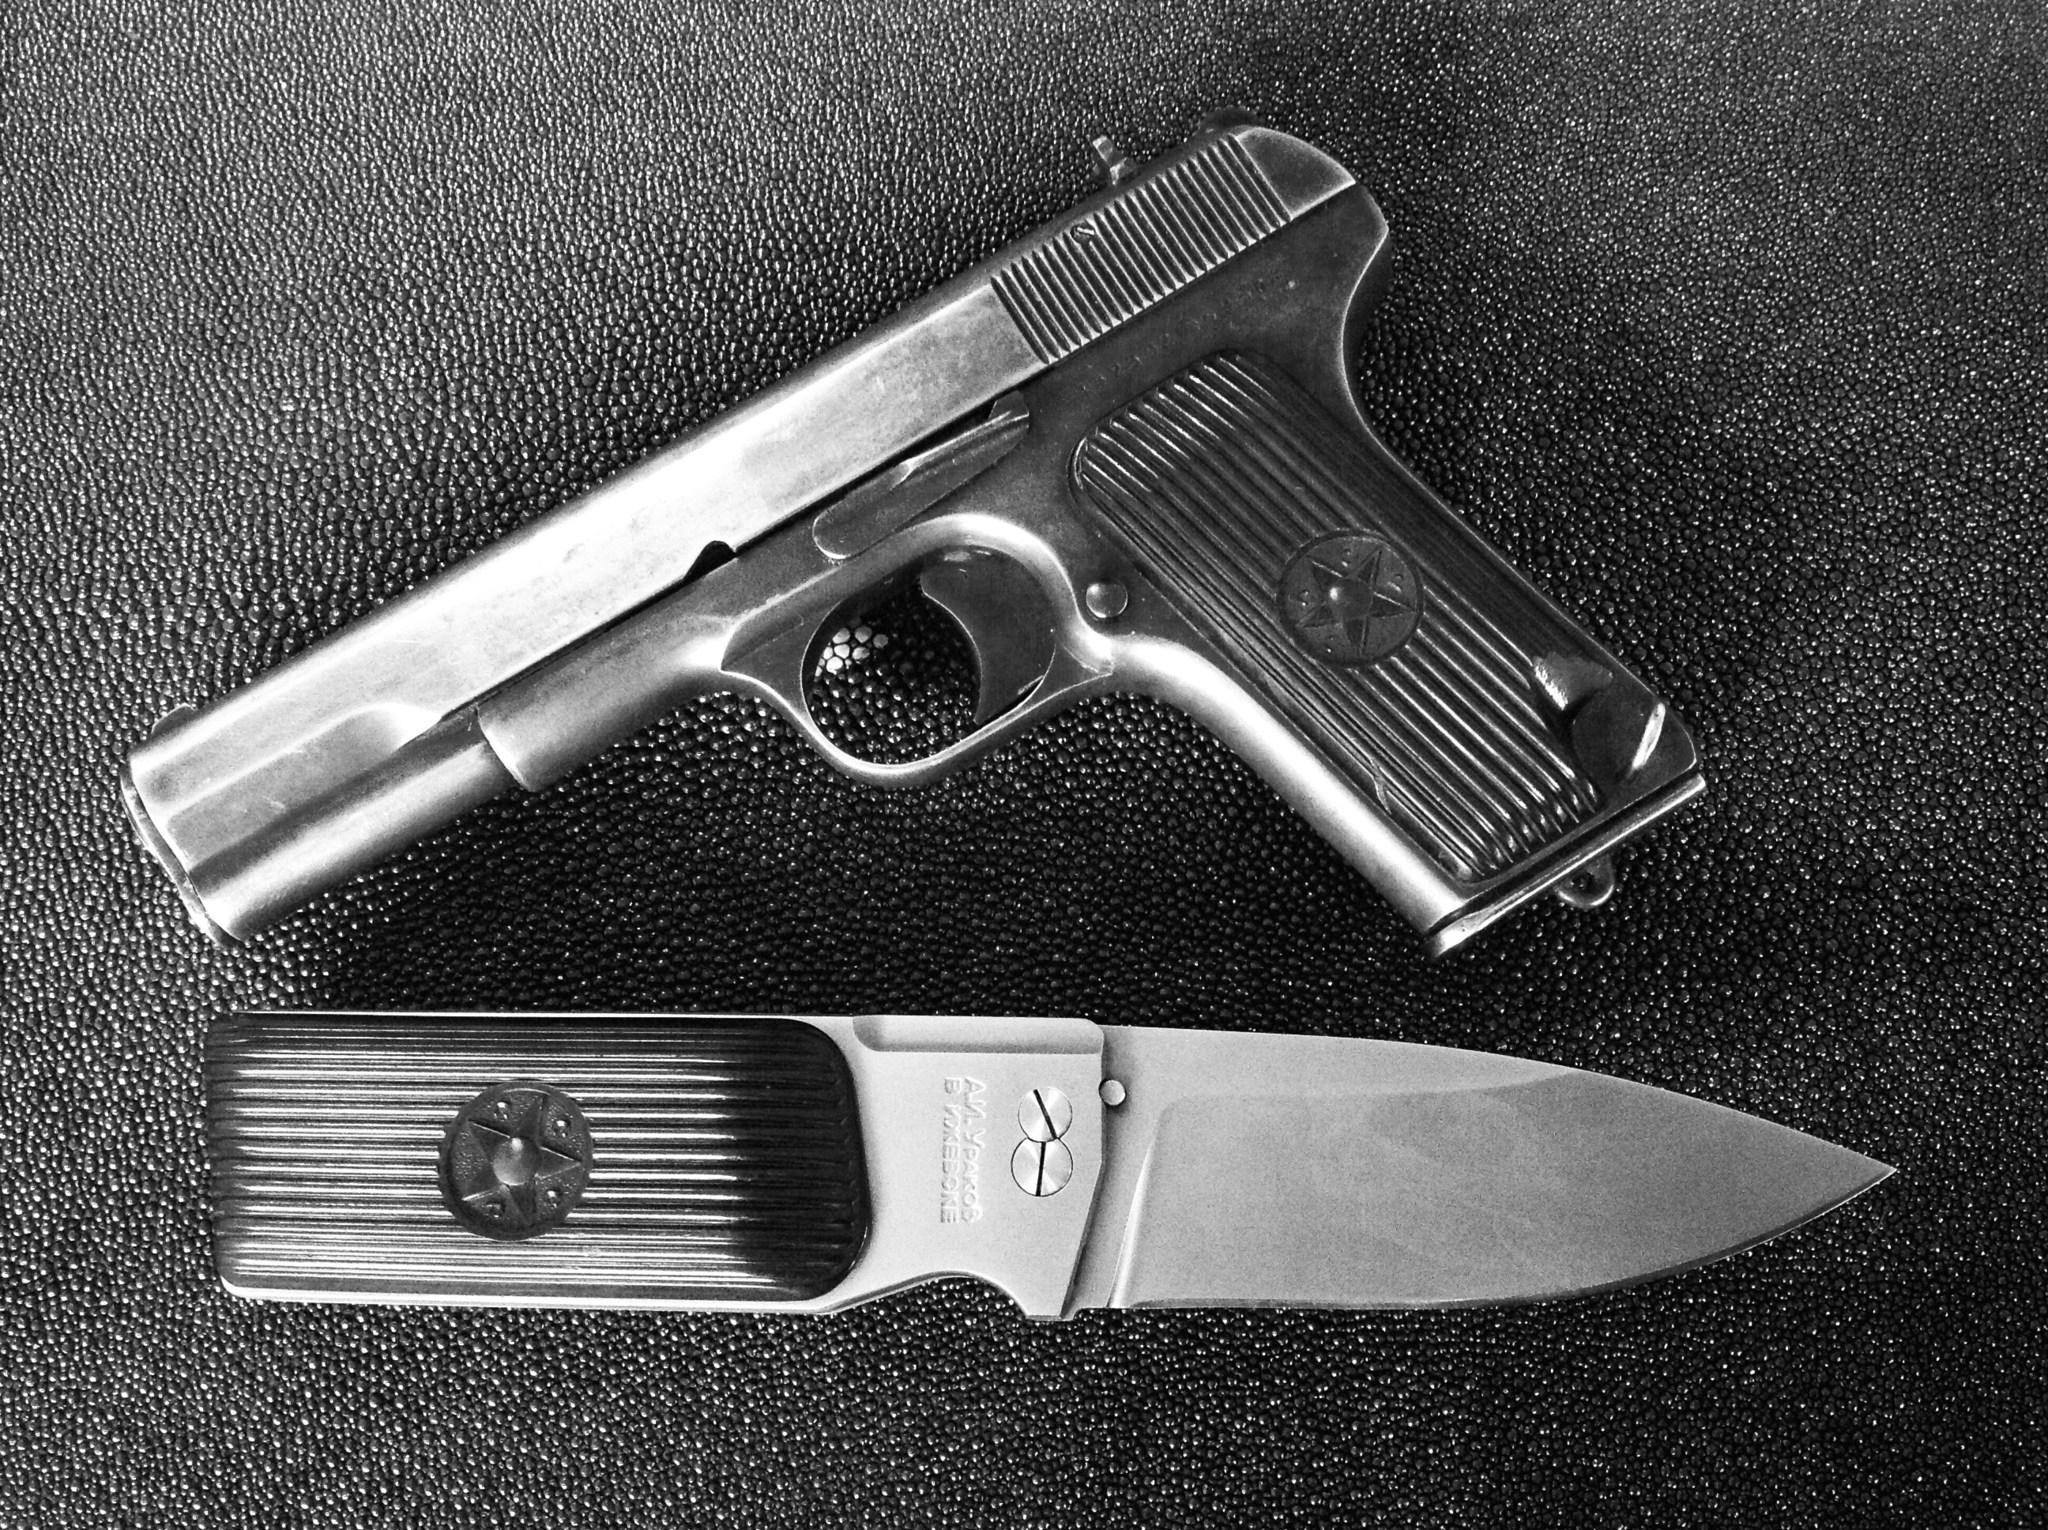 Нож Уракова А.И. ТТ-33 440С - фотография